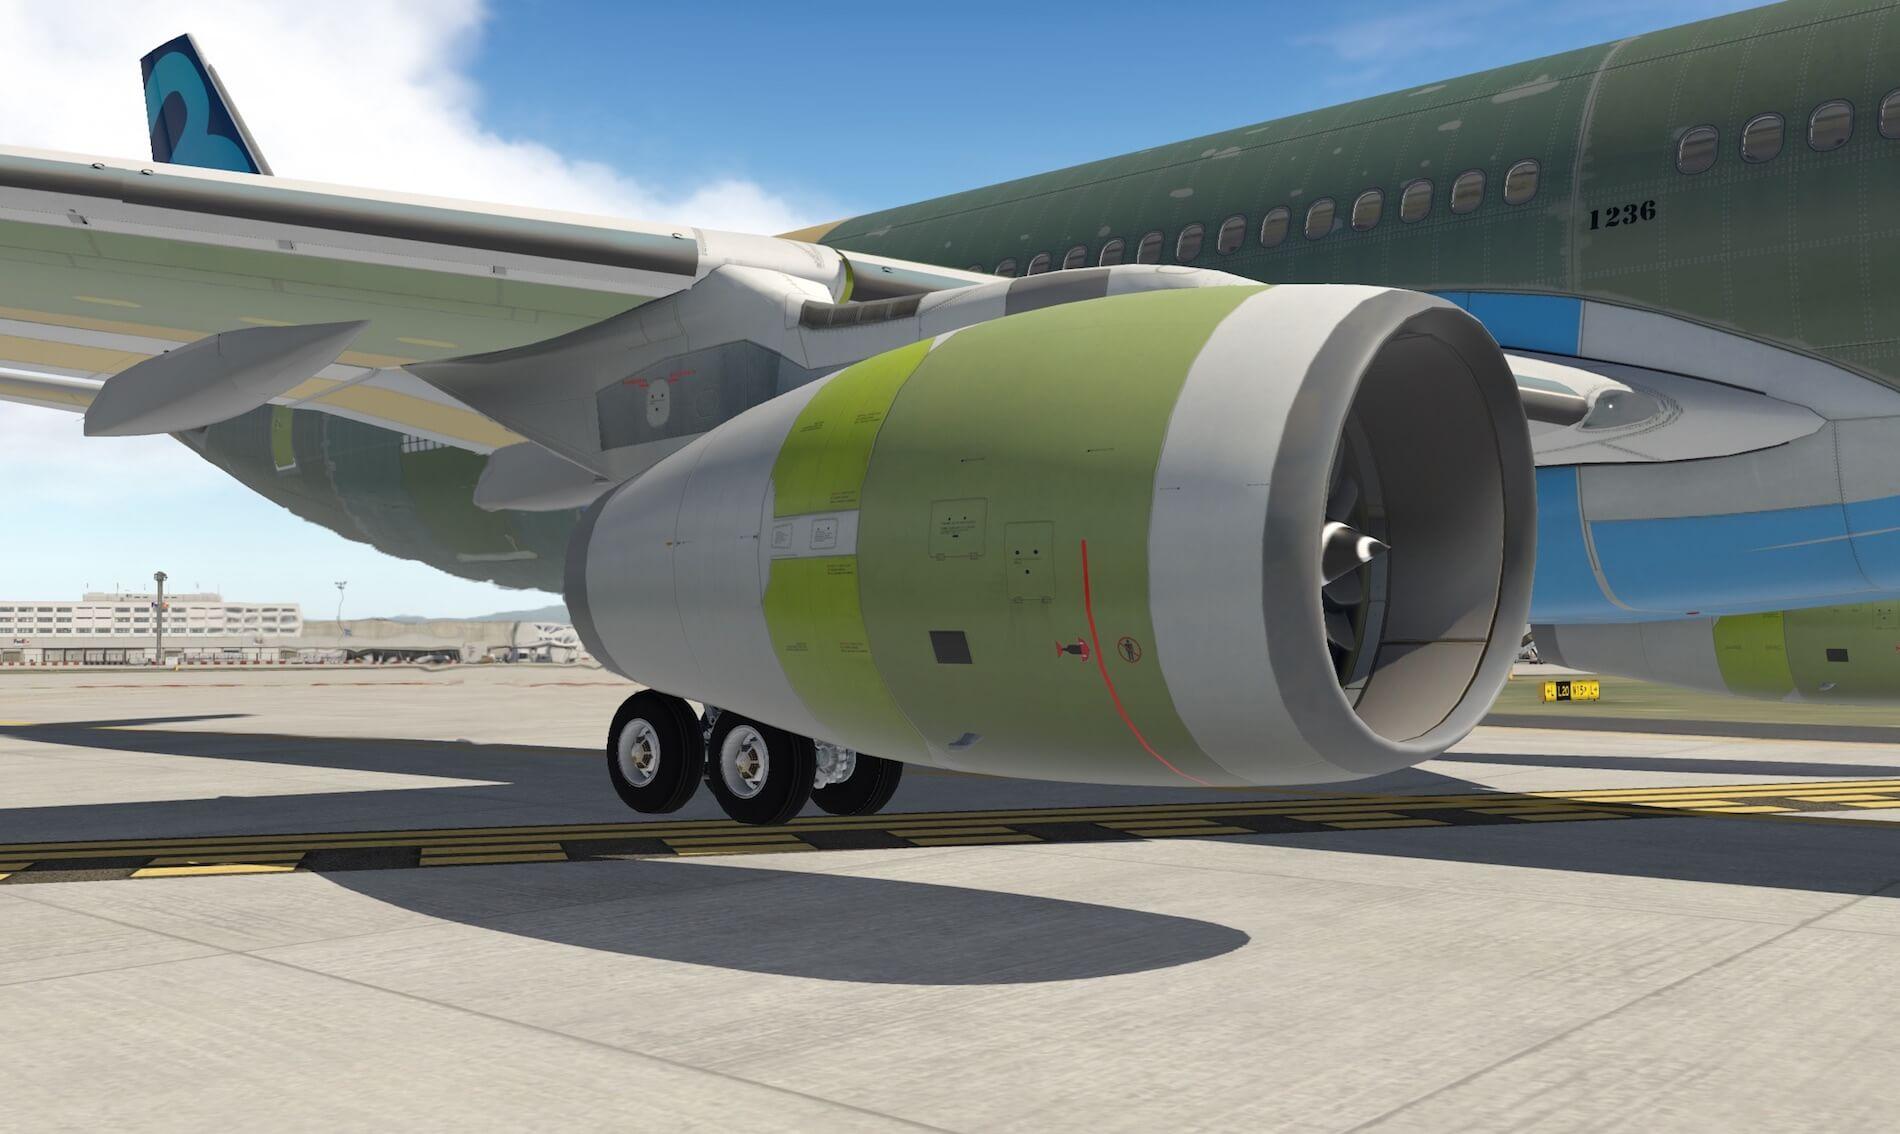 Jar Design A330 Livery Related Keywords & Suggestions - Jar